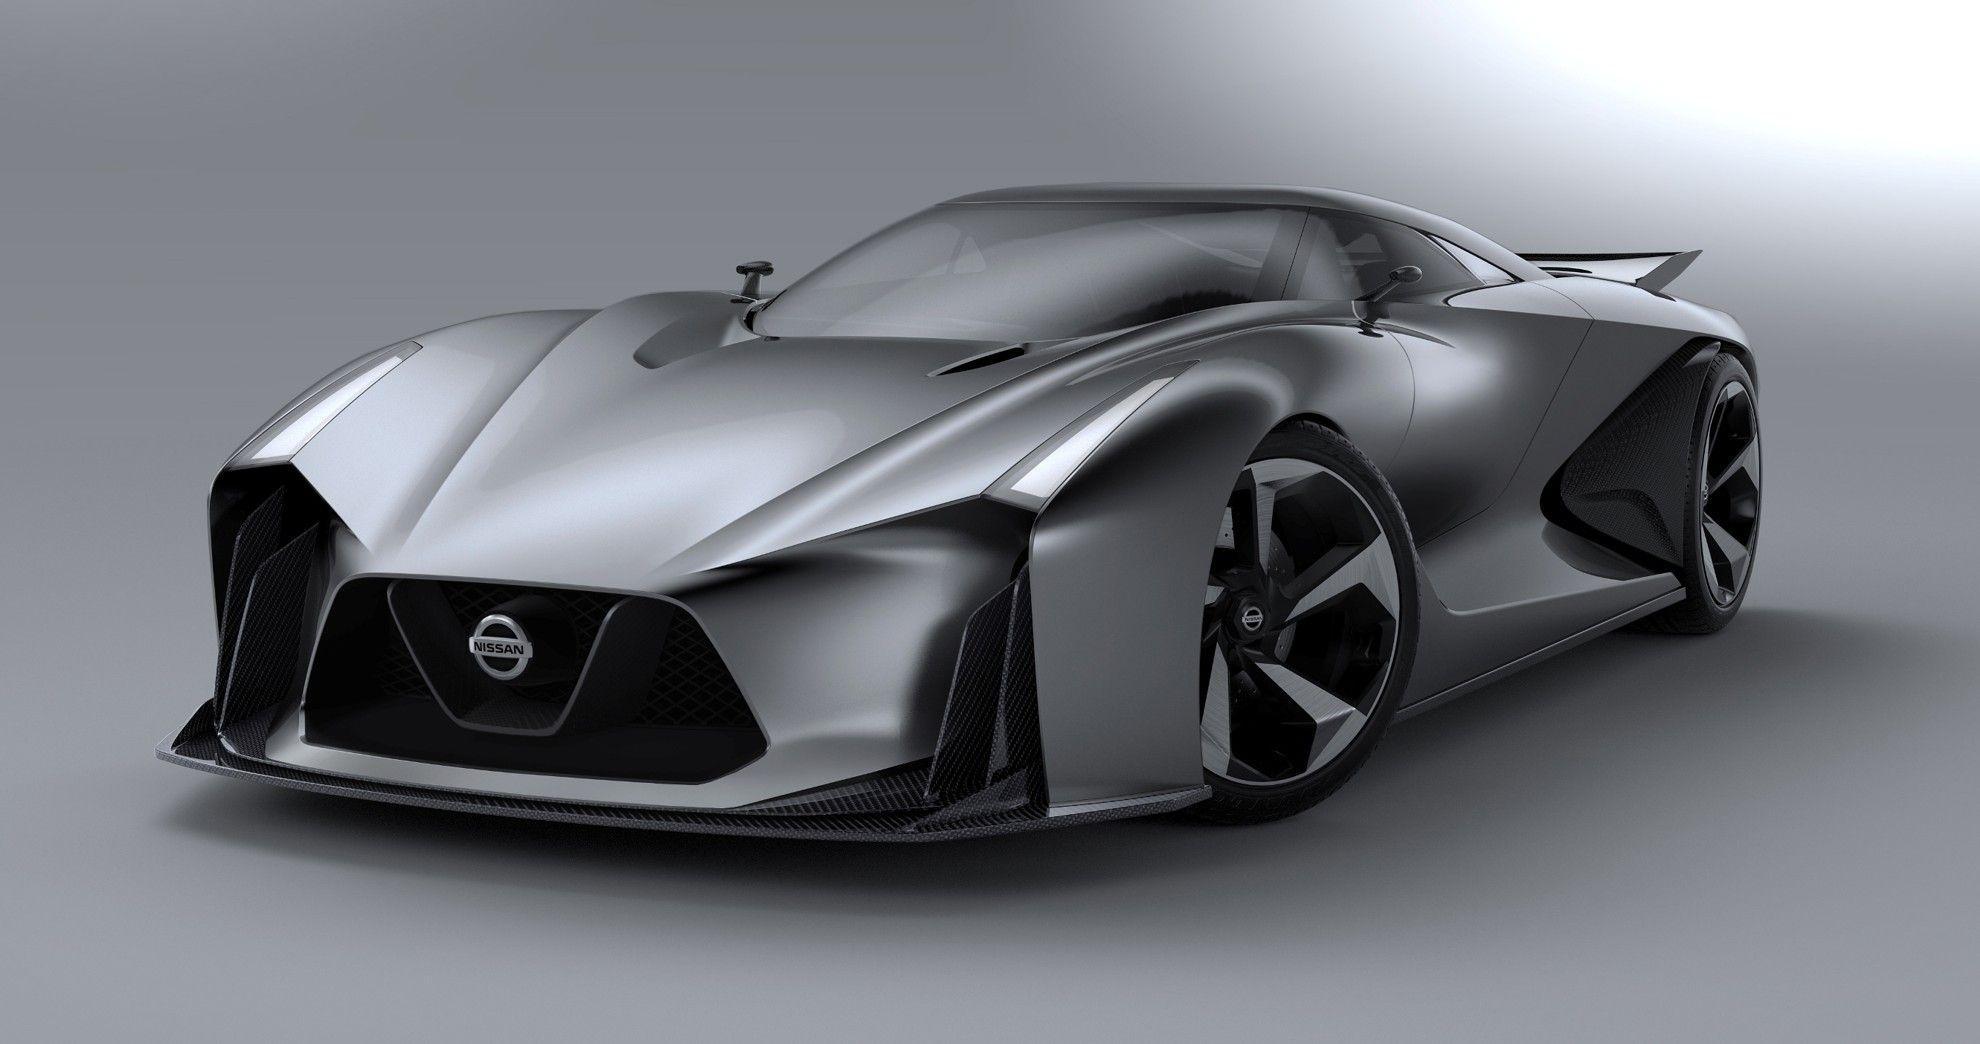 Nissan Gtr 2020 Google Search Super Cars Nissan Gtr Nismo Gtr